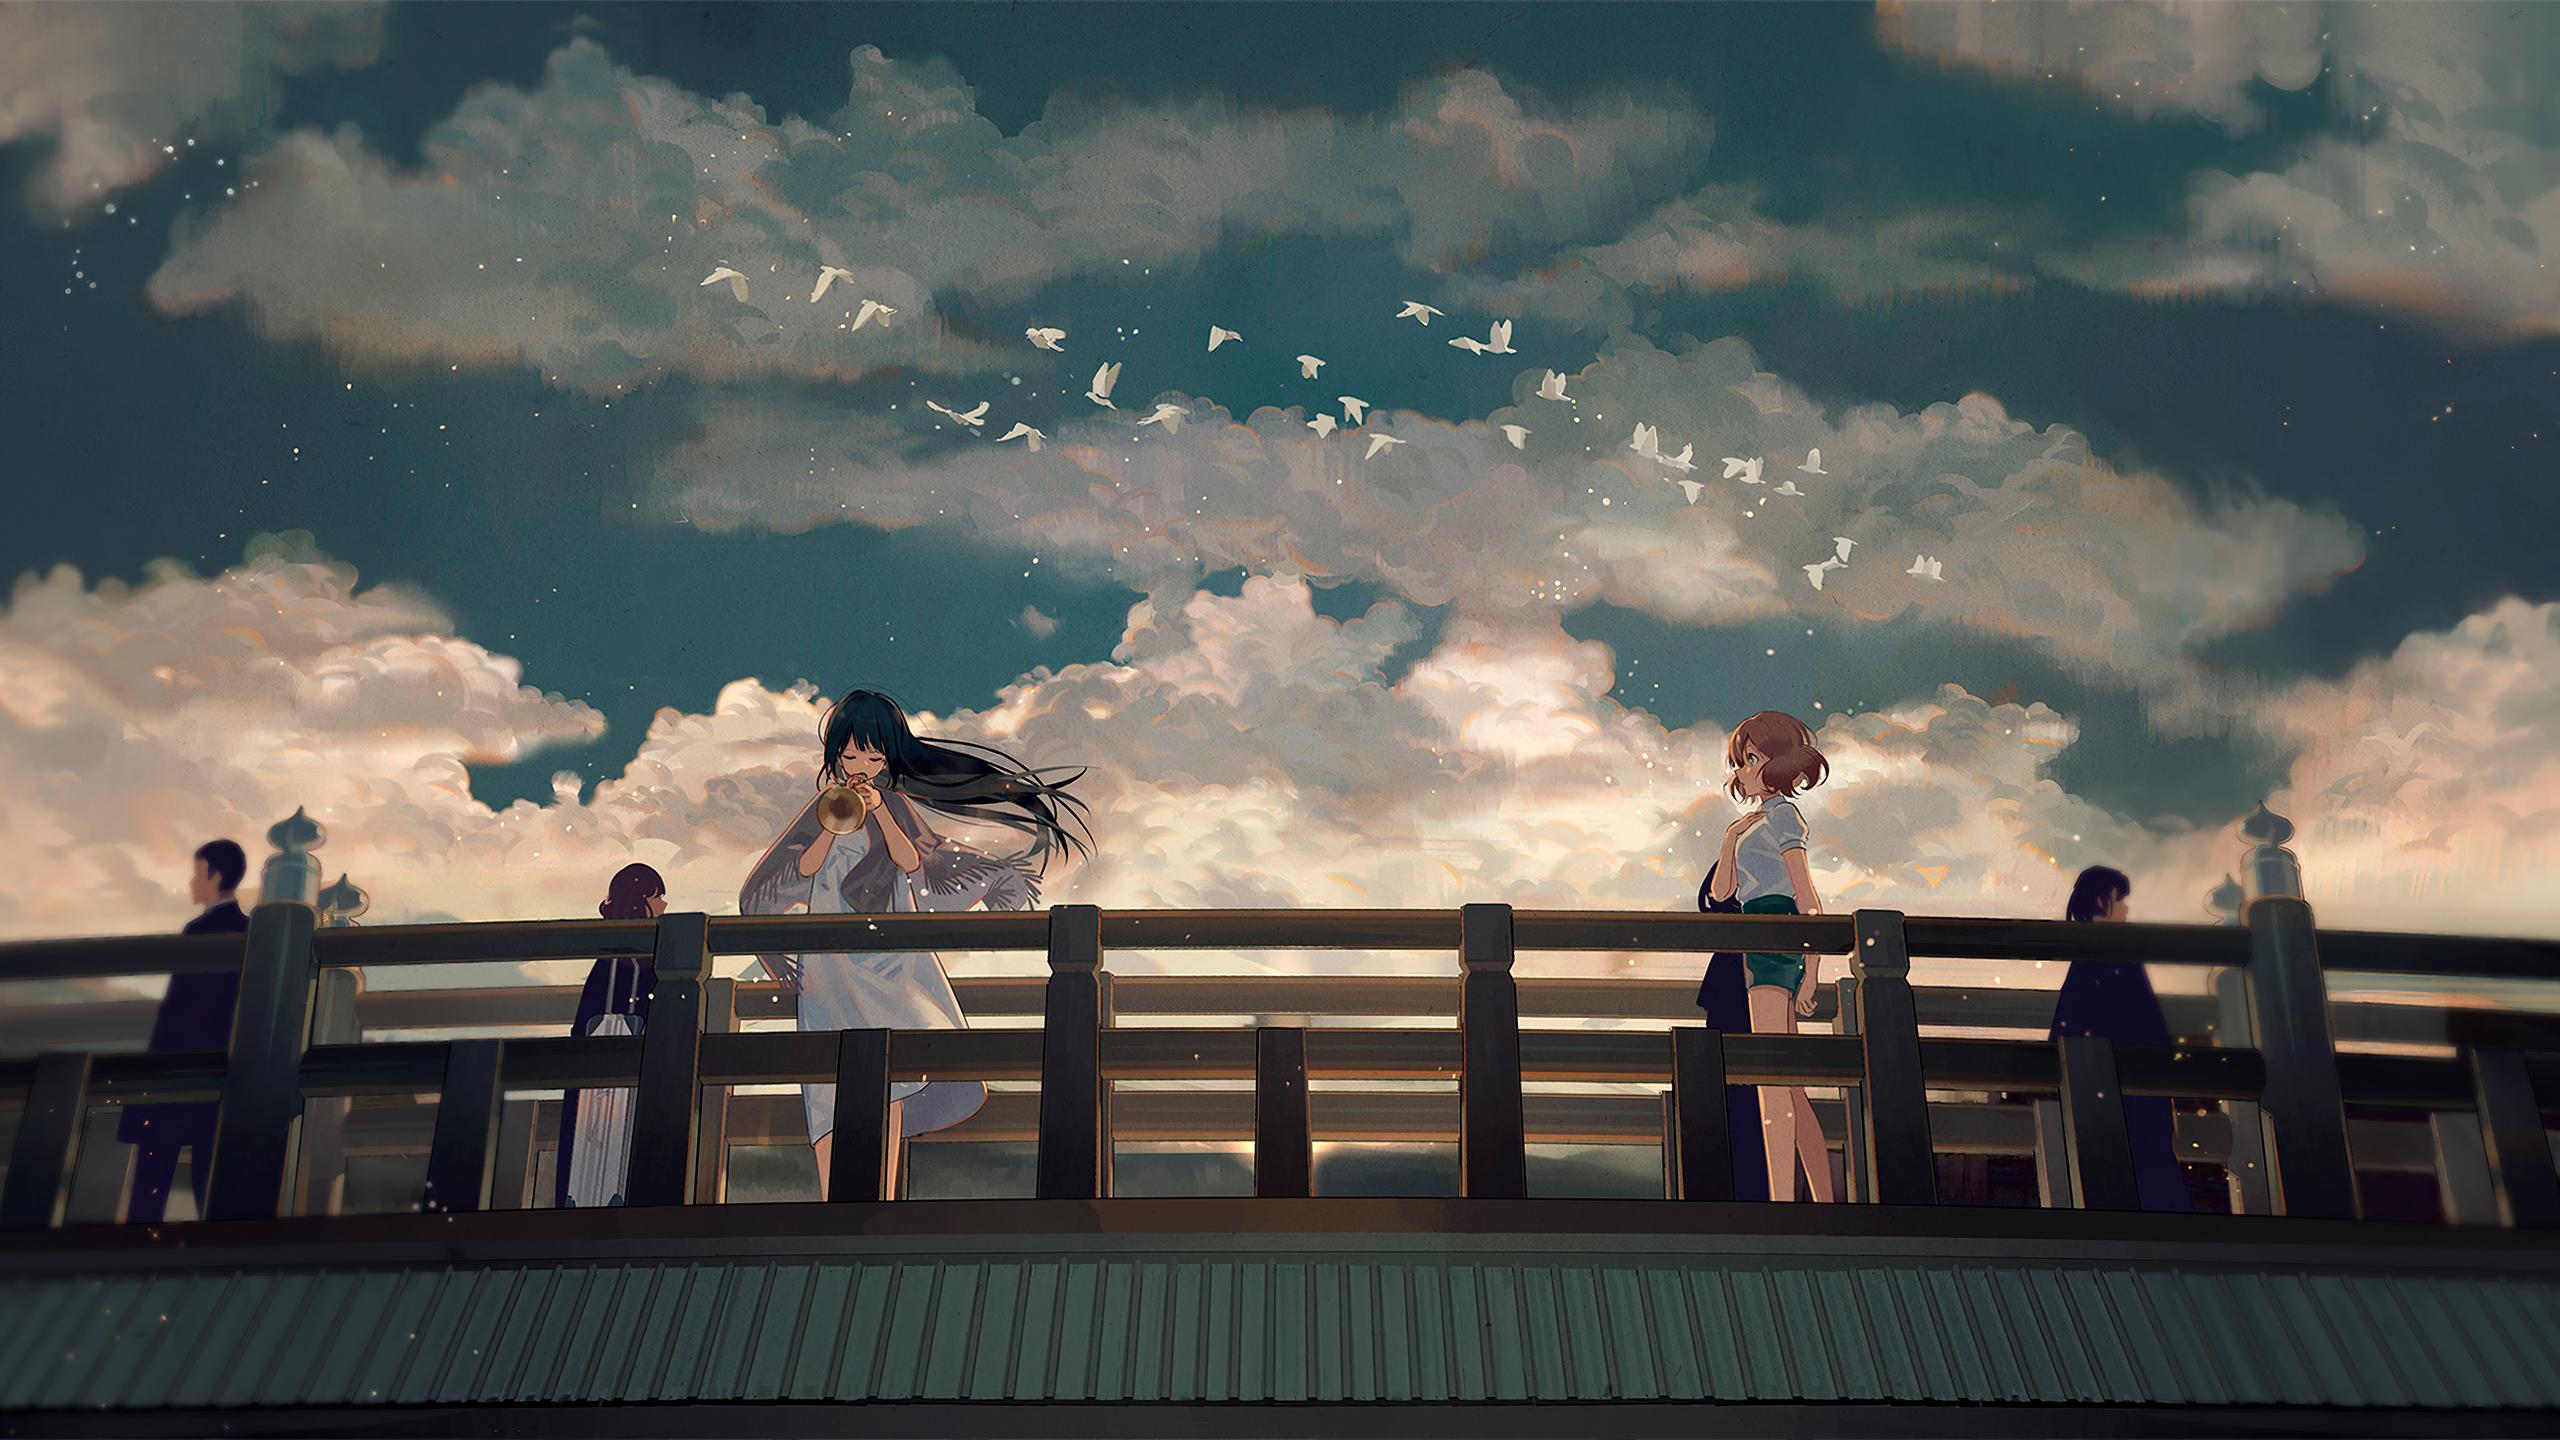 kousaka-reina-oumae-kumiko-anime-girls-4k-um.jpg